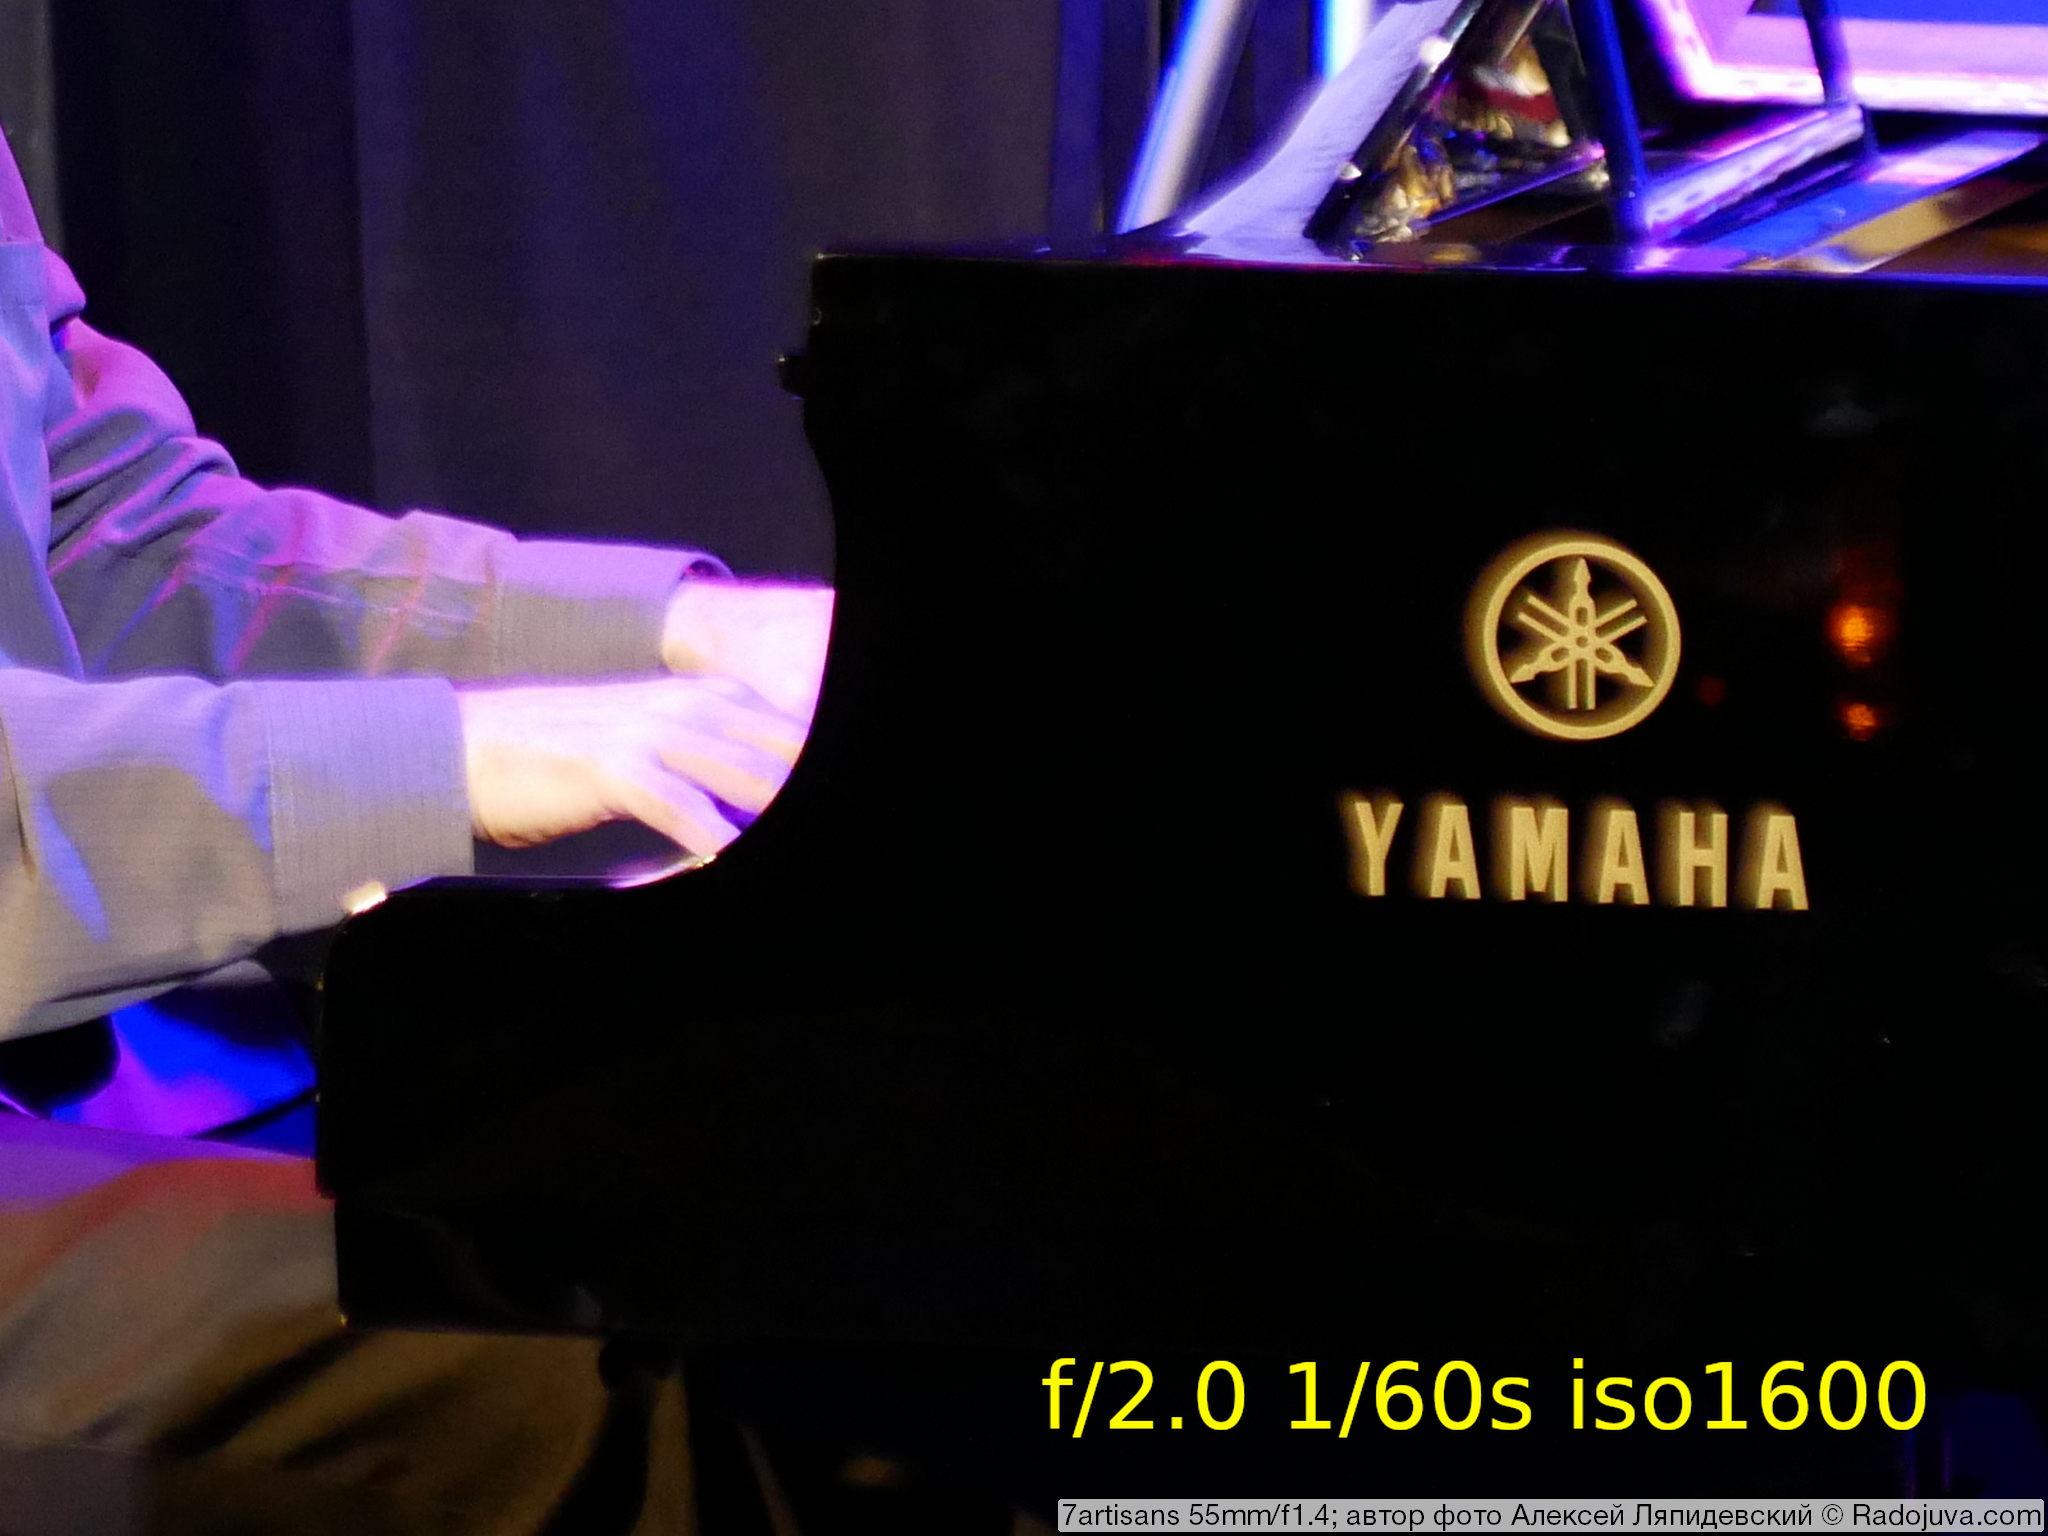 Пример фото на 7artisans 55mm f/1.4